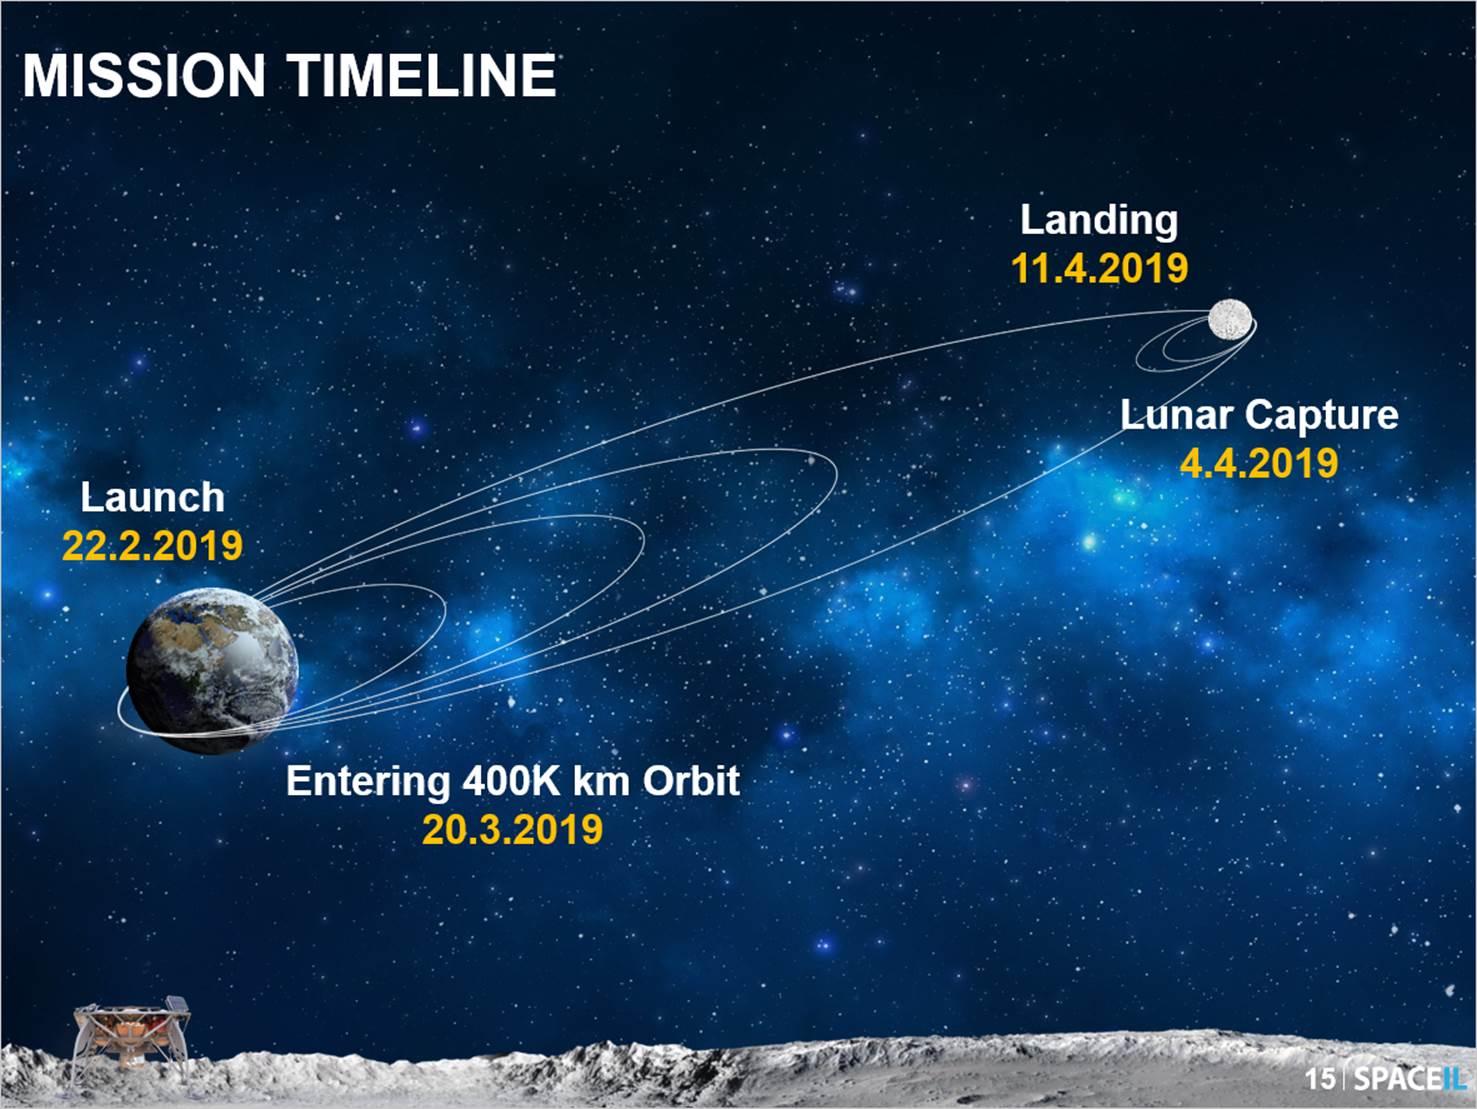 SpaceIL mission timeline